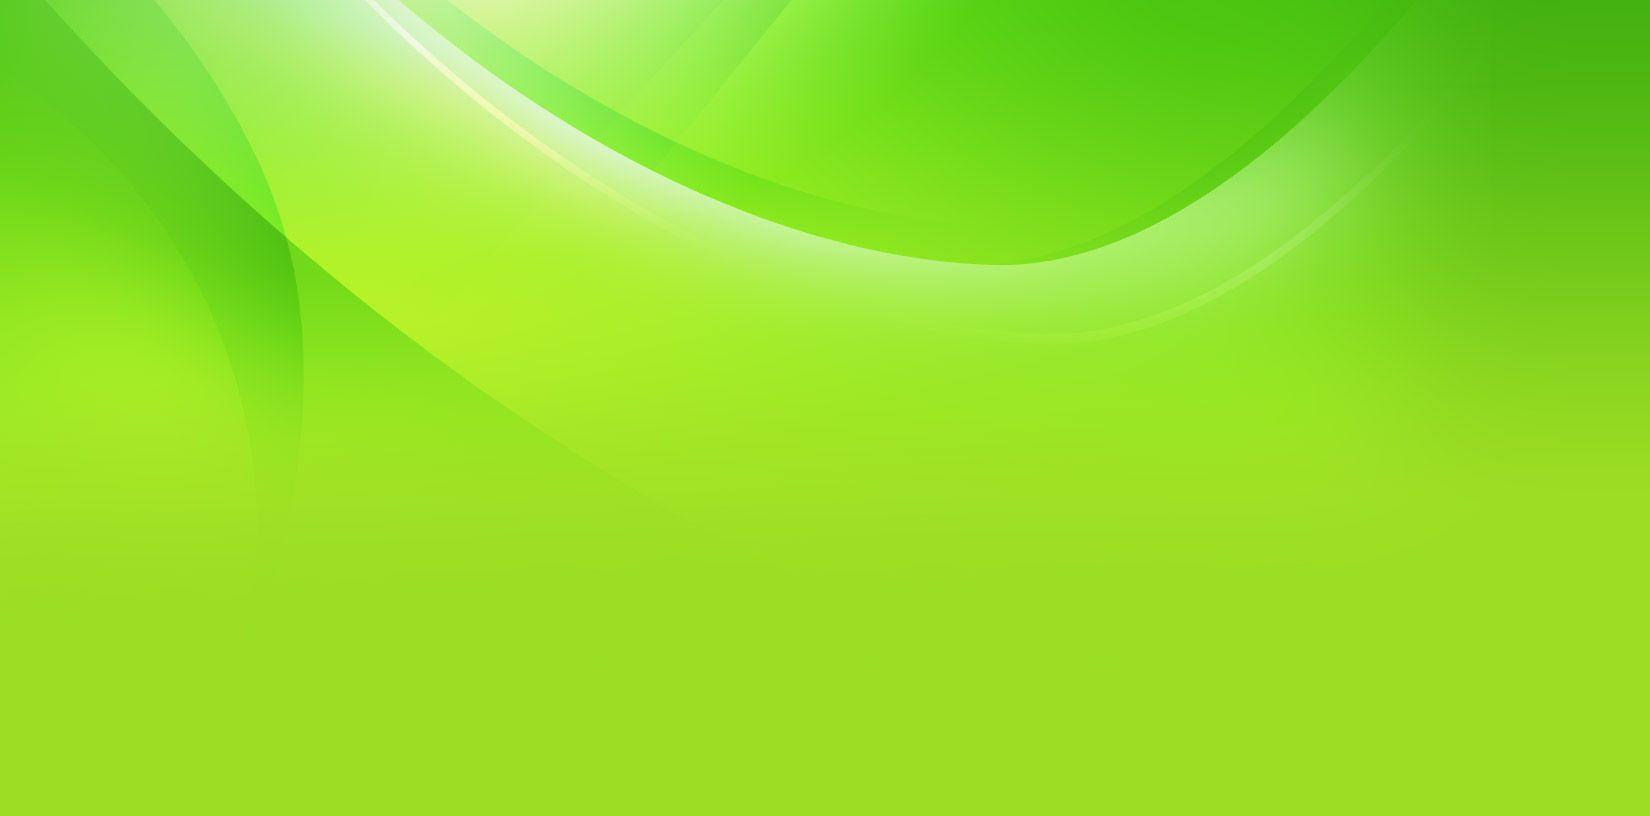 backgrounds hijau wallpaper cave